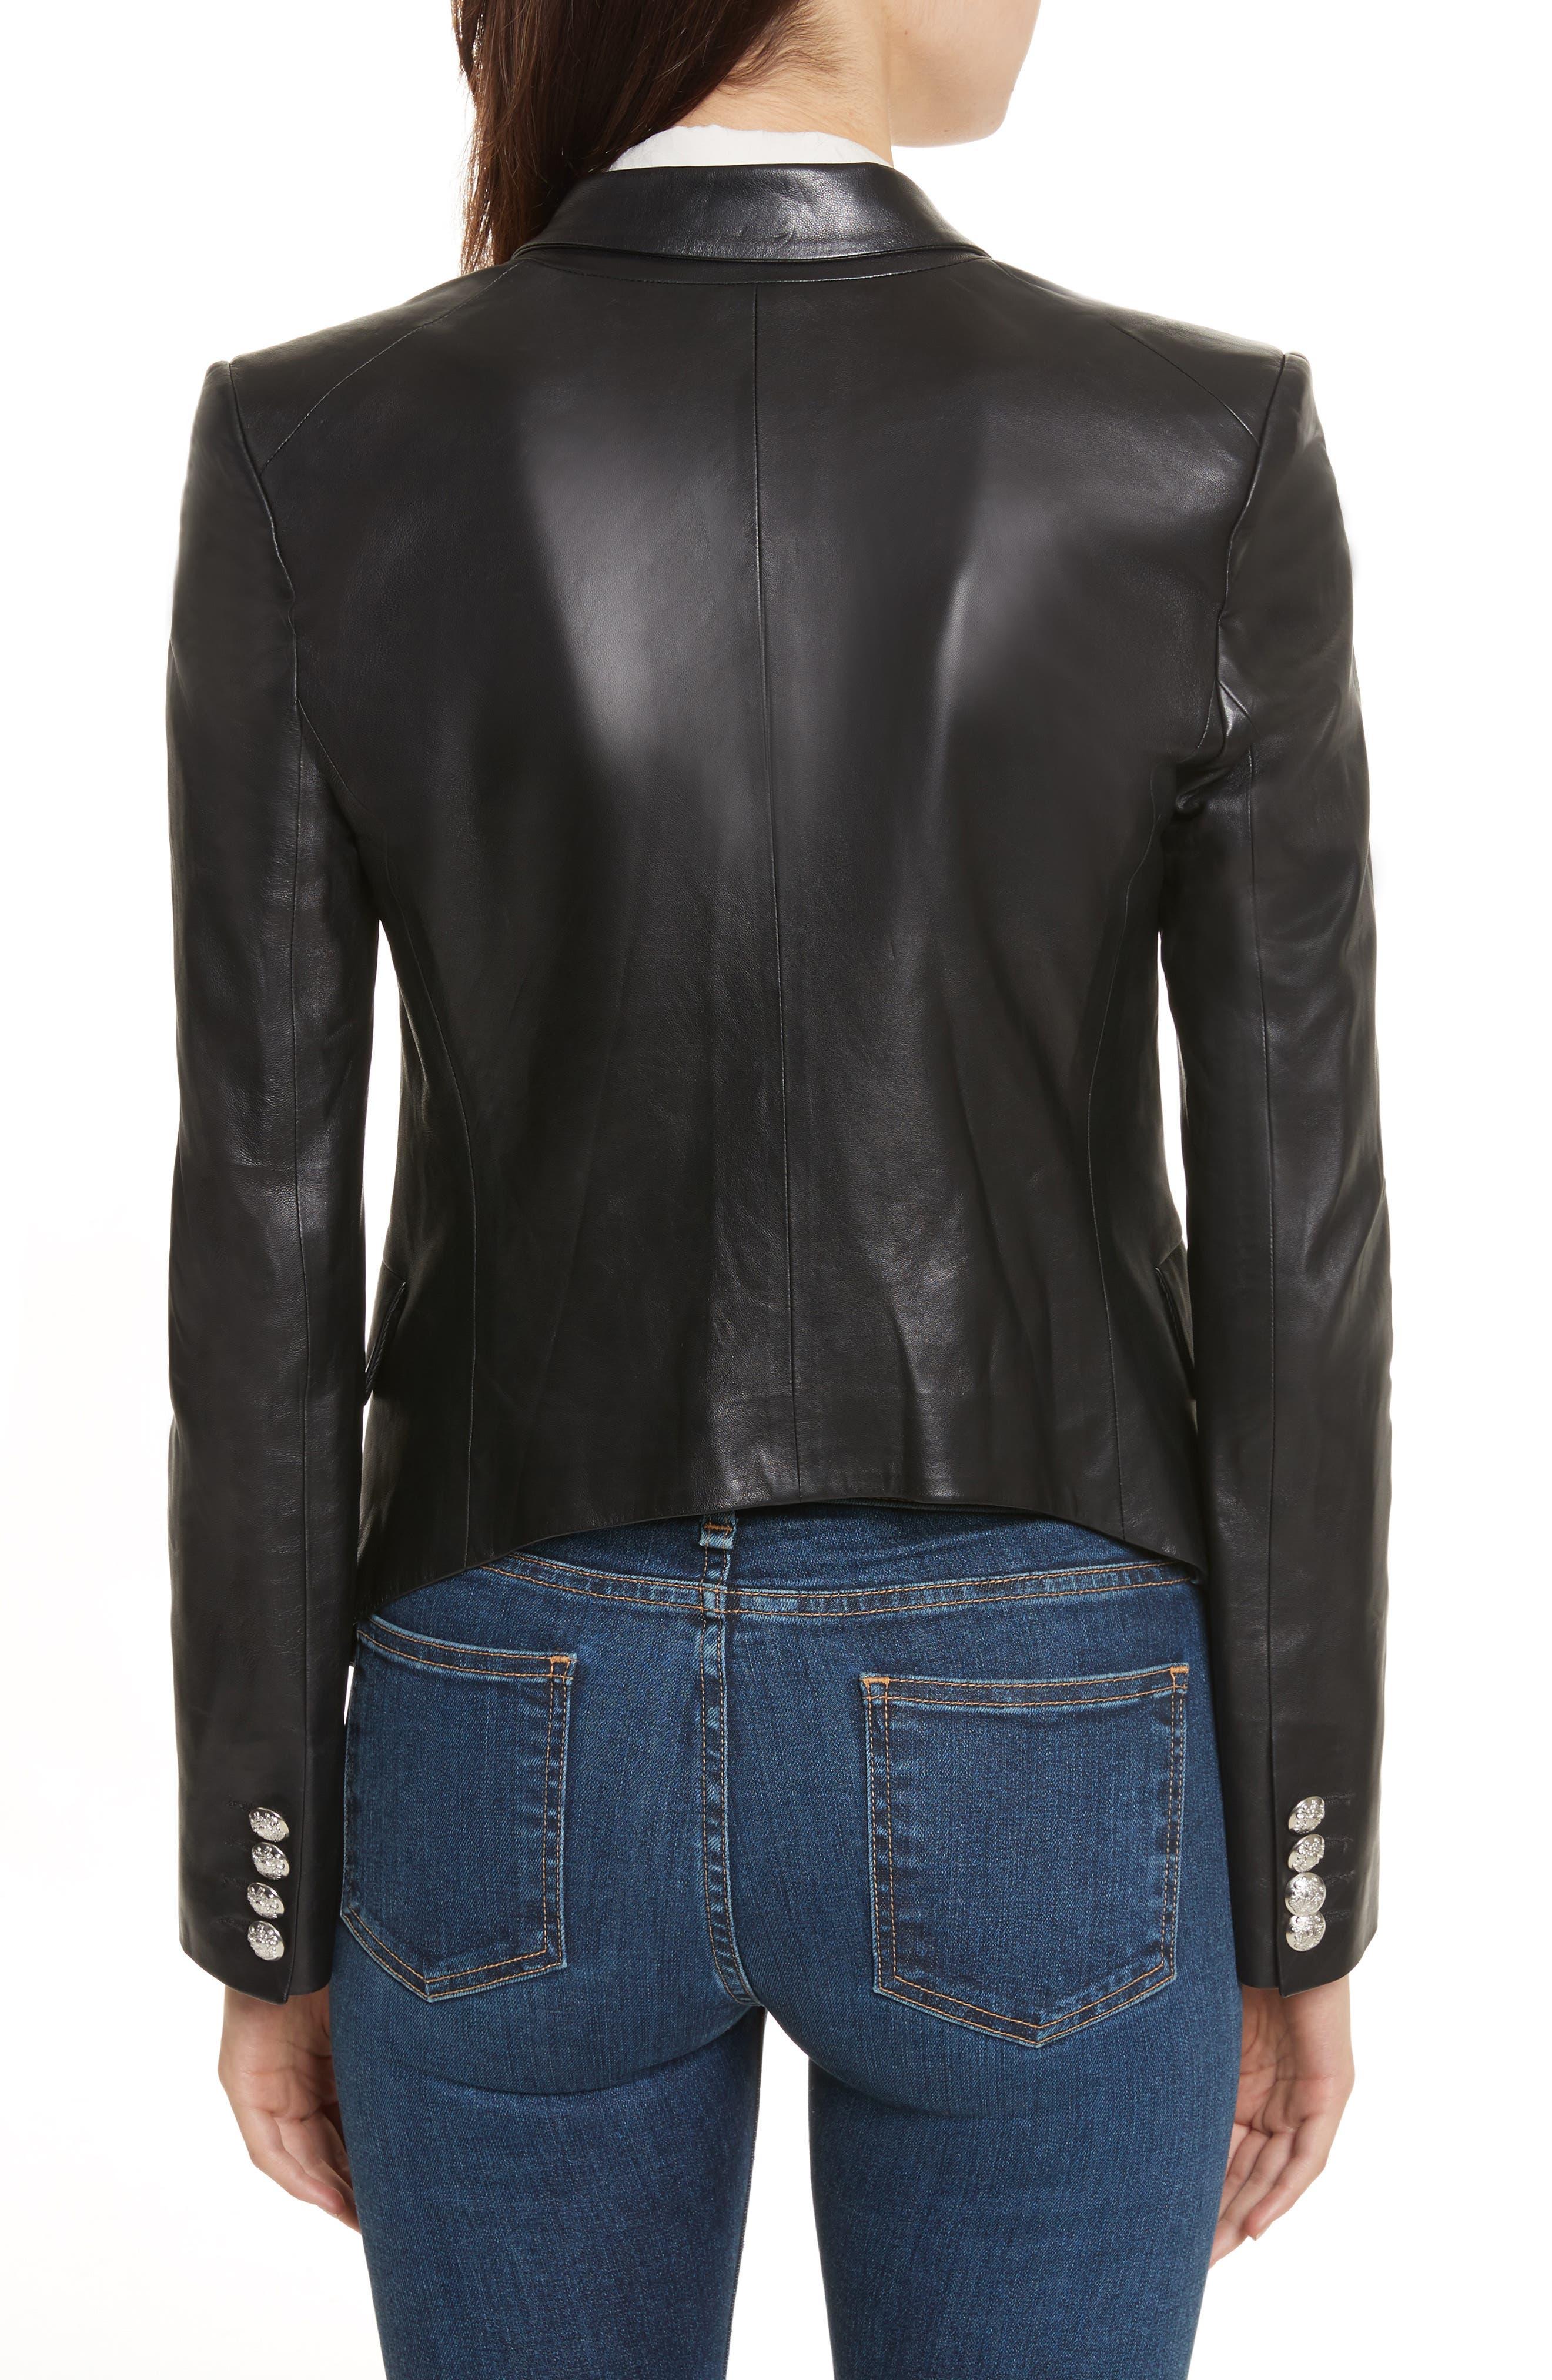 Cooke Leather Jacket,                             Alternate thumbnail 2, color,                             Black